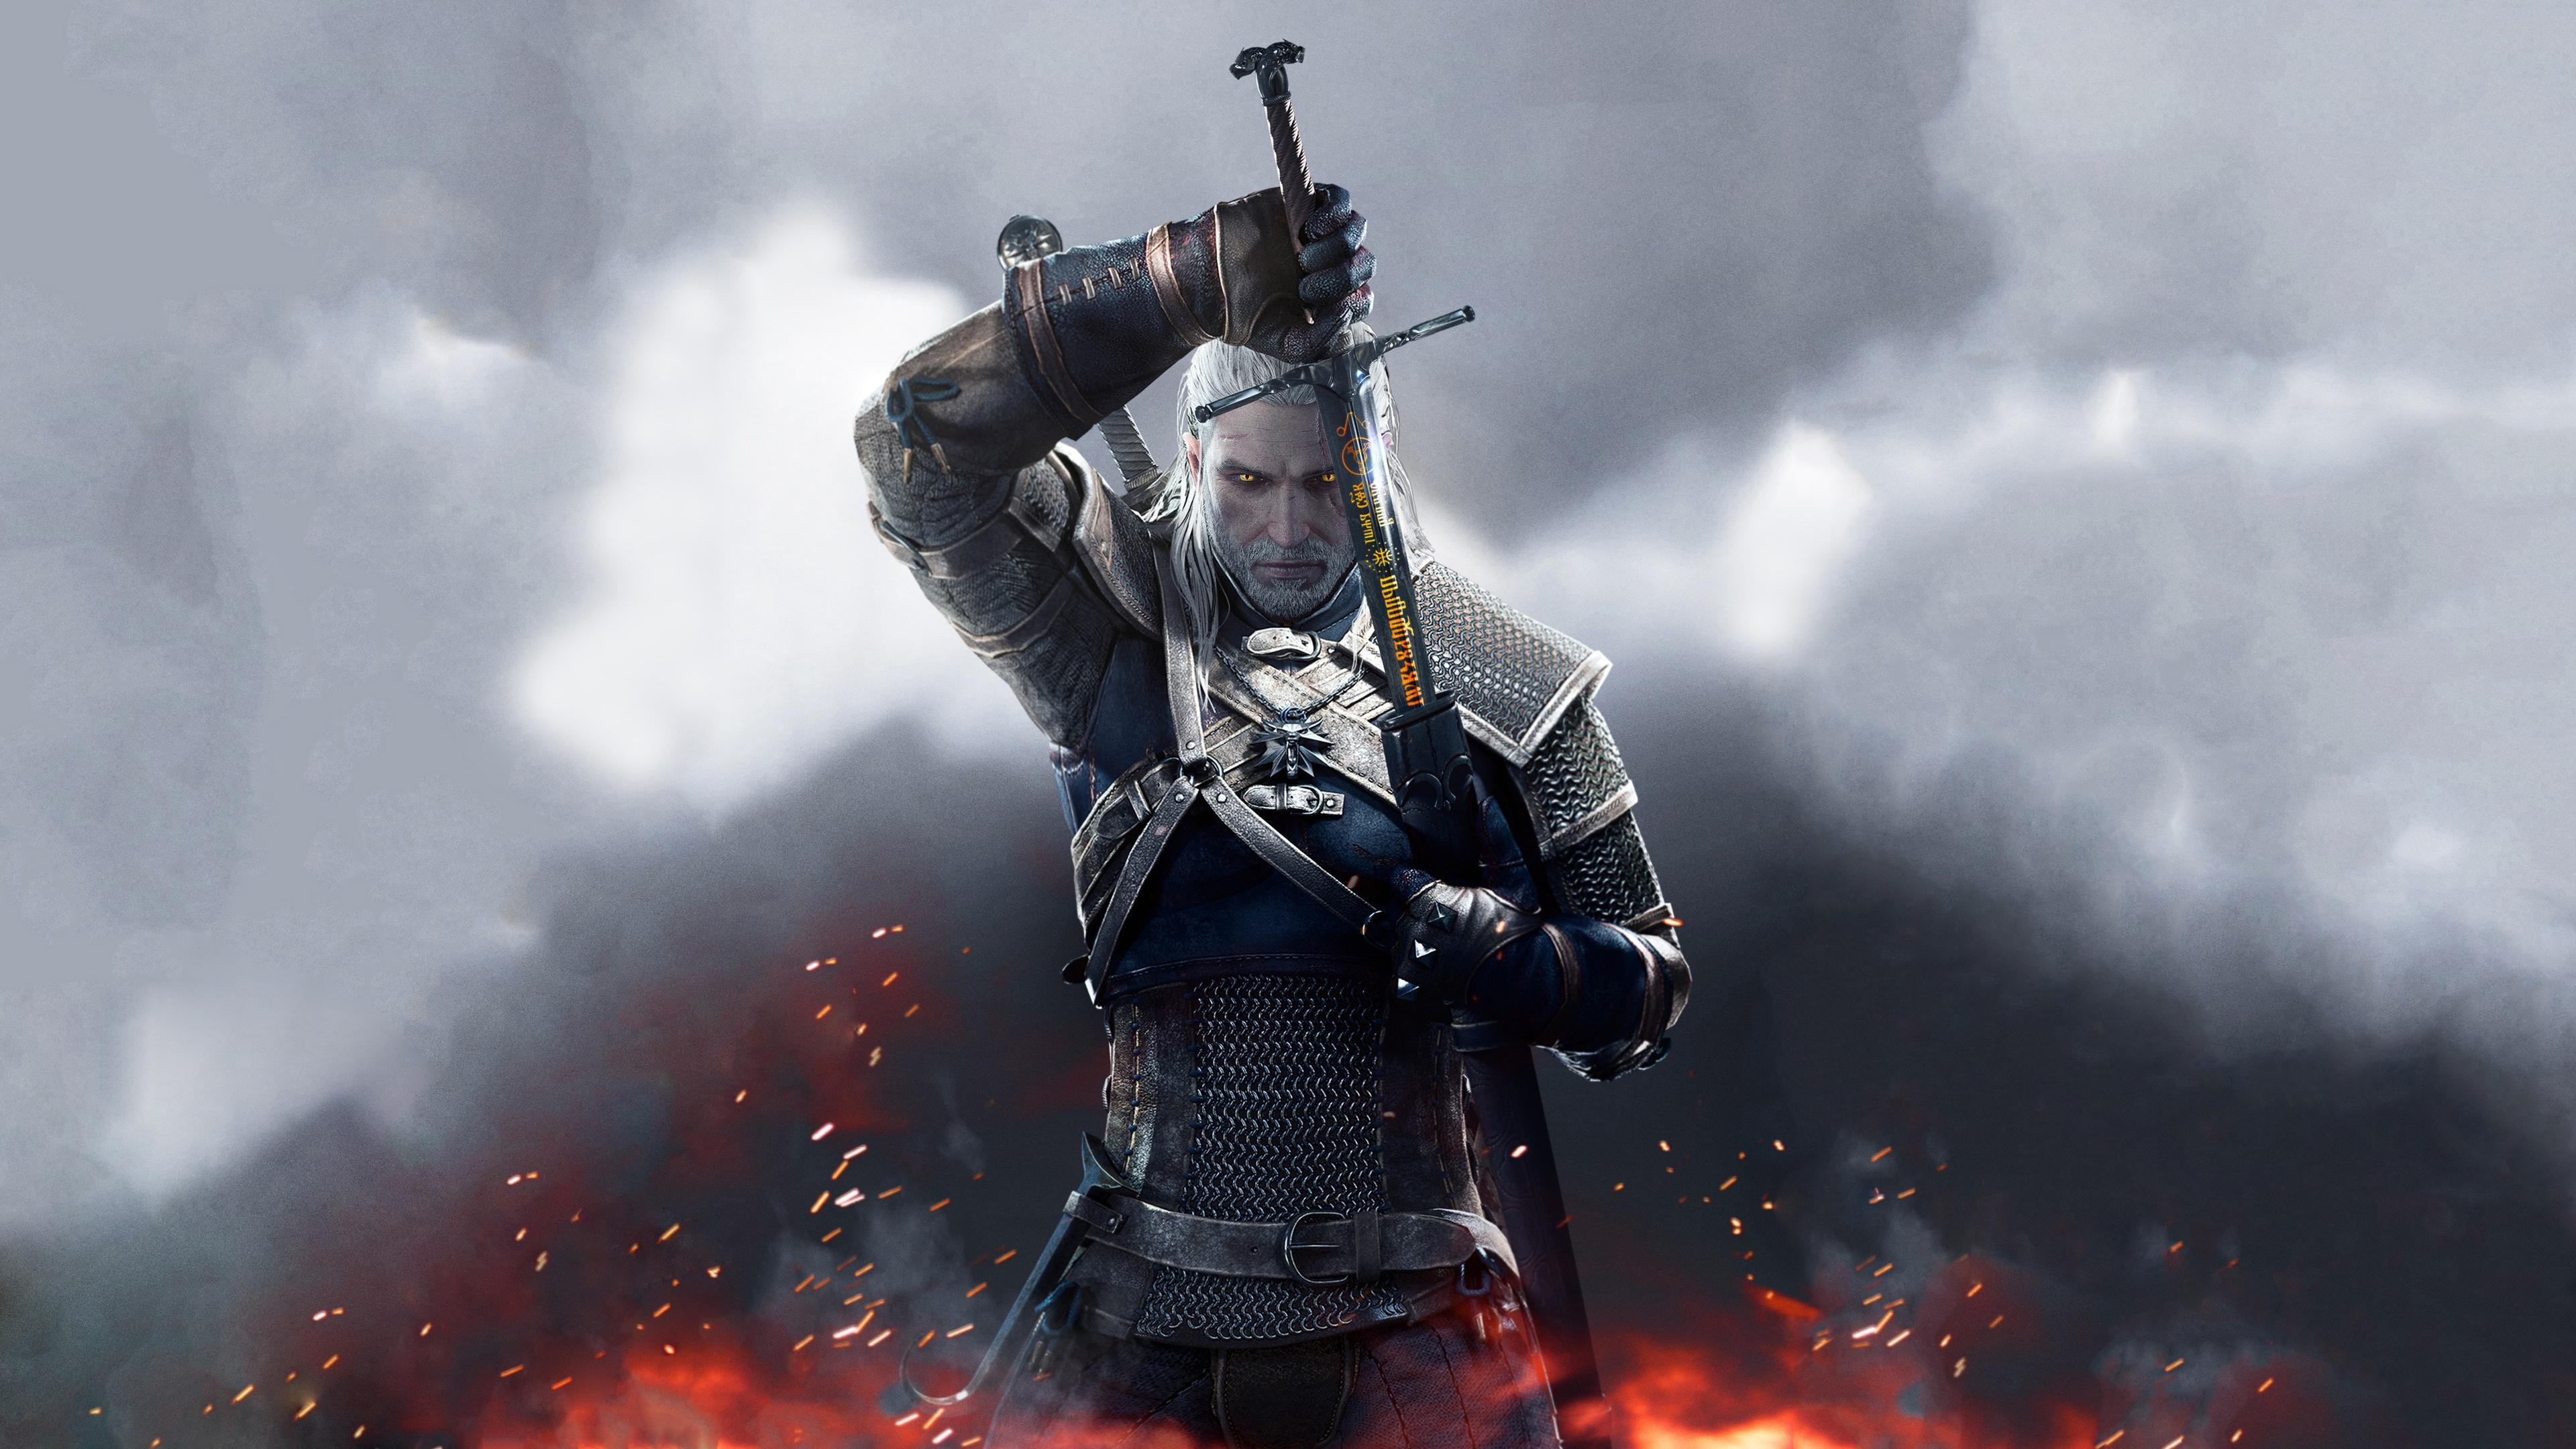 The Witcher 3 Wild Hunt Sword of Destiny Ultra HD Wallpaper, 4k - HD ...